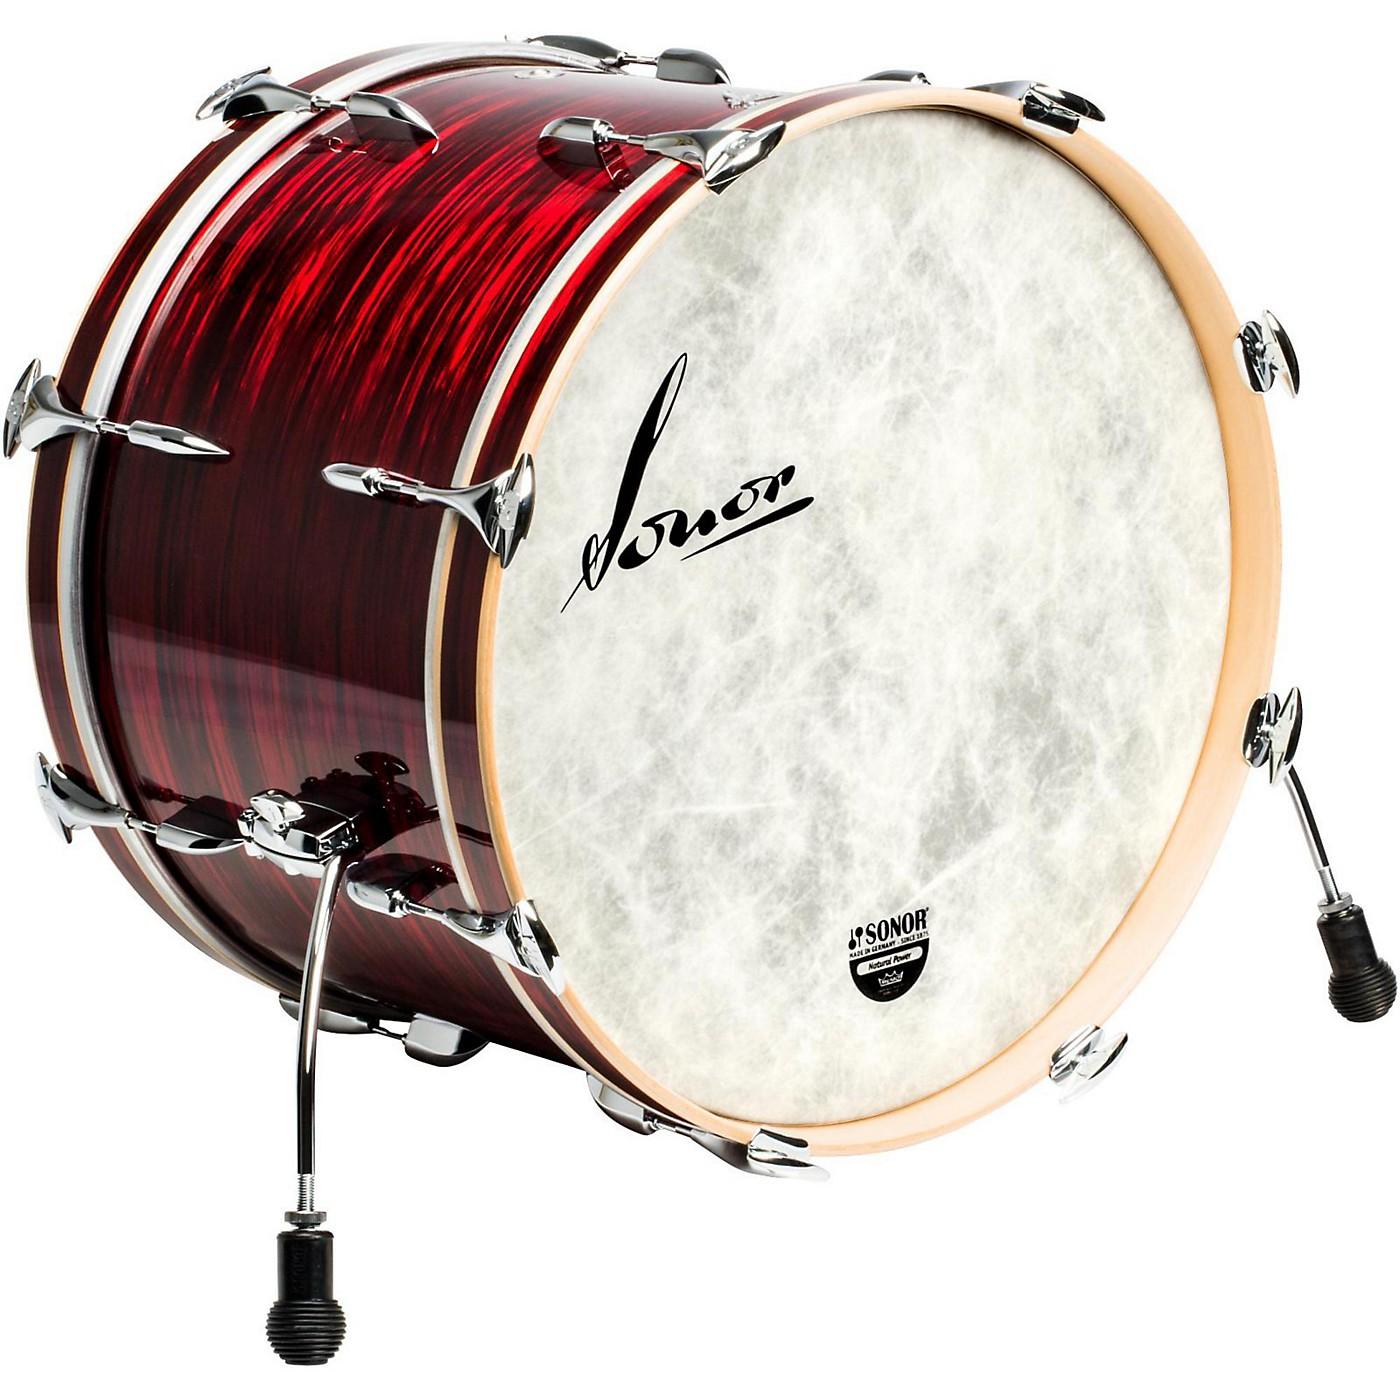 SONOR Vintage Series Bass Drum NM thumbnail